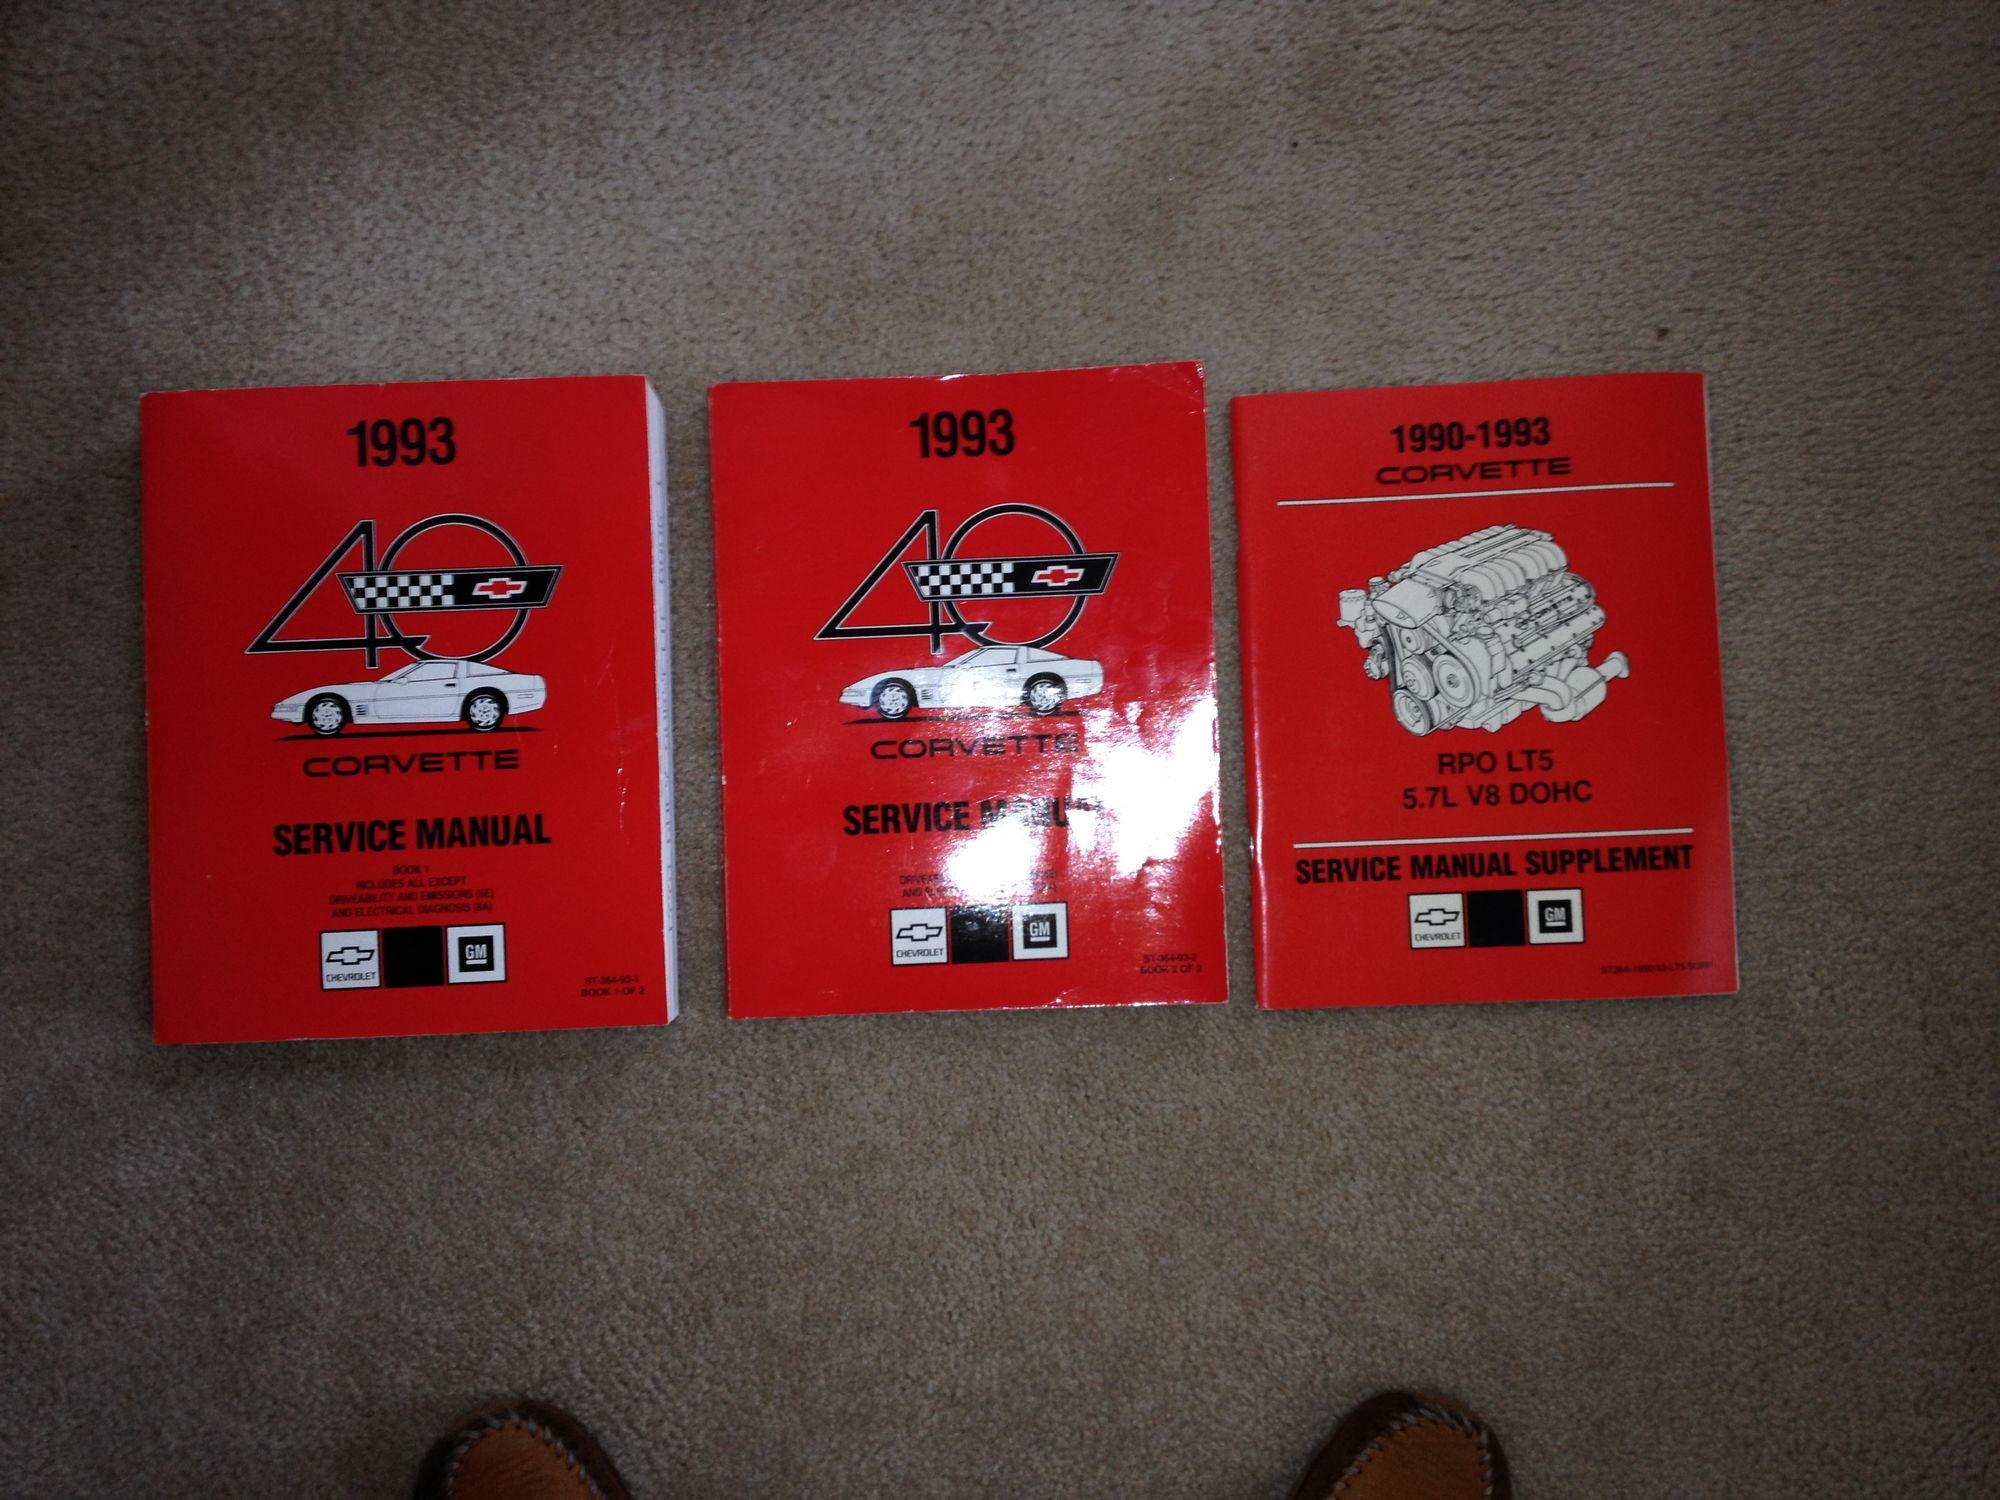 1993 factory service manual corvetteforum chevrolet 95 Corvette 1985 corvette repair manual pdf